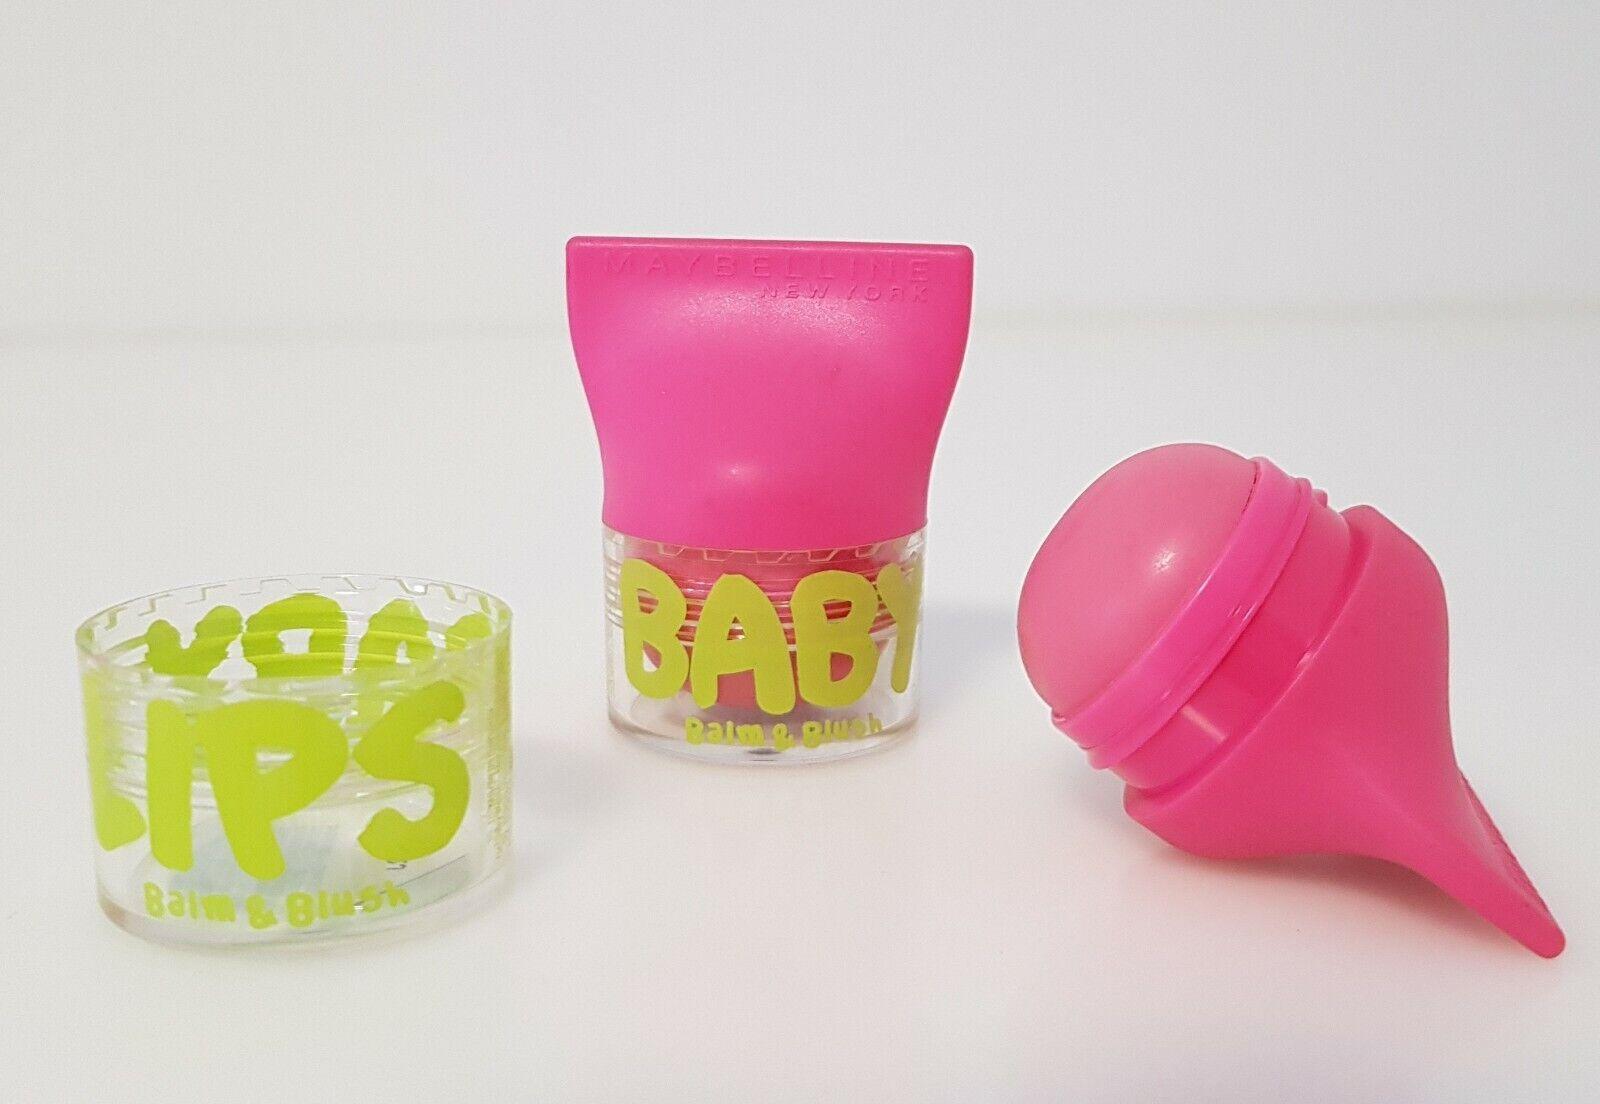 Maybelline Baby Lips Balm & Rush Lippenbalsam Lippenpflege 02 Flirty Pink